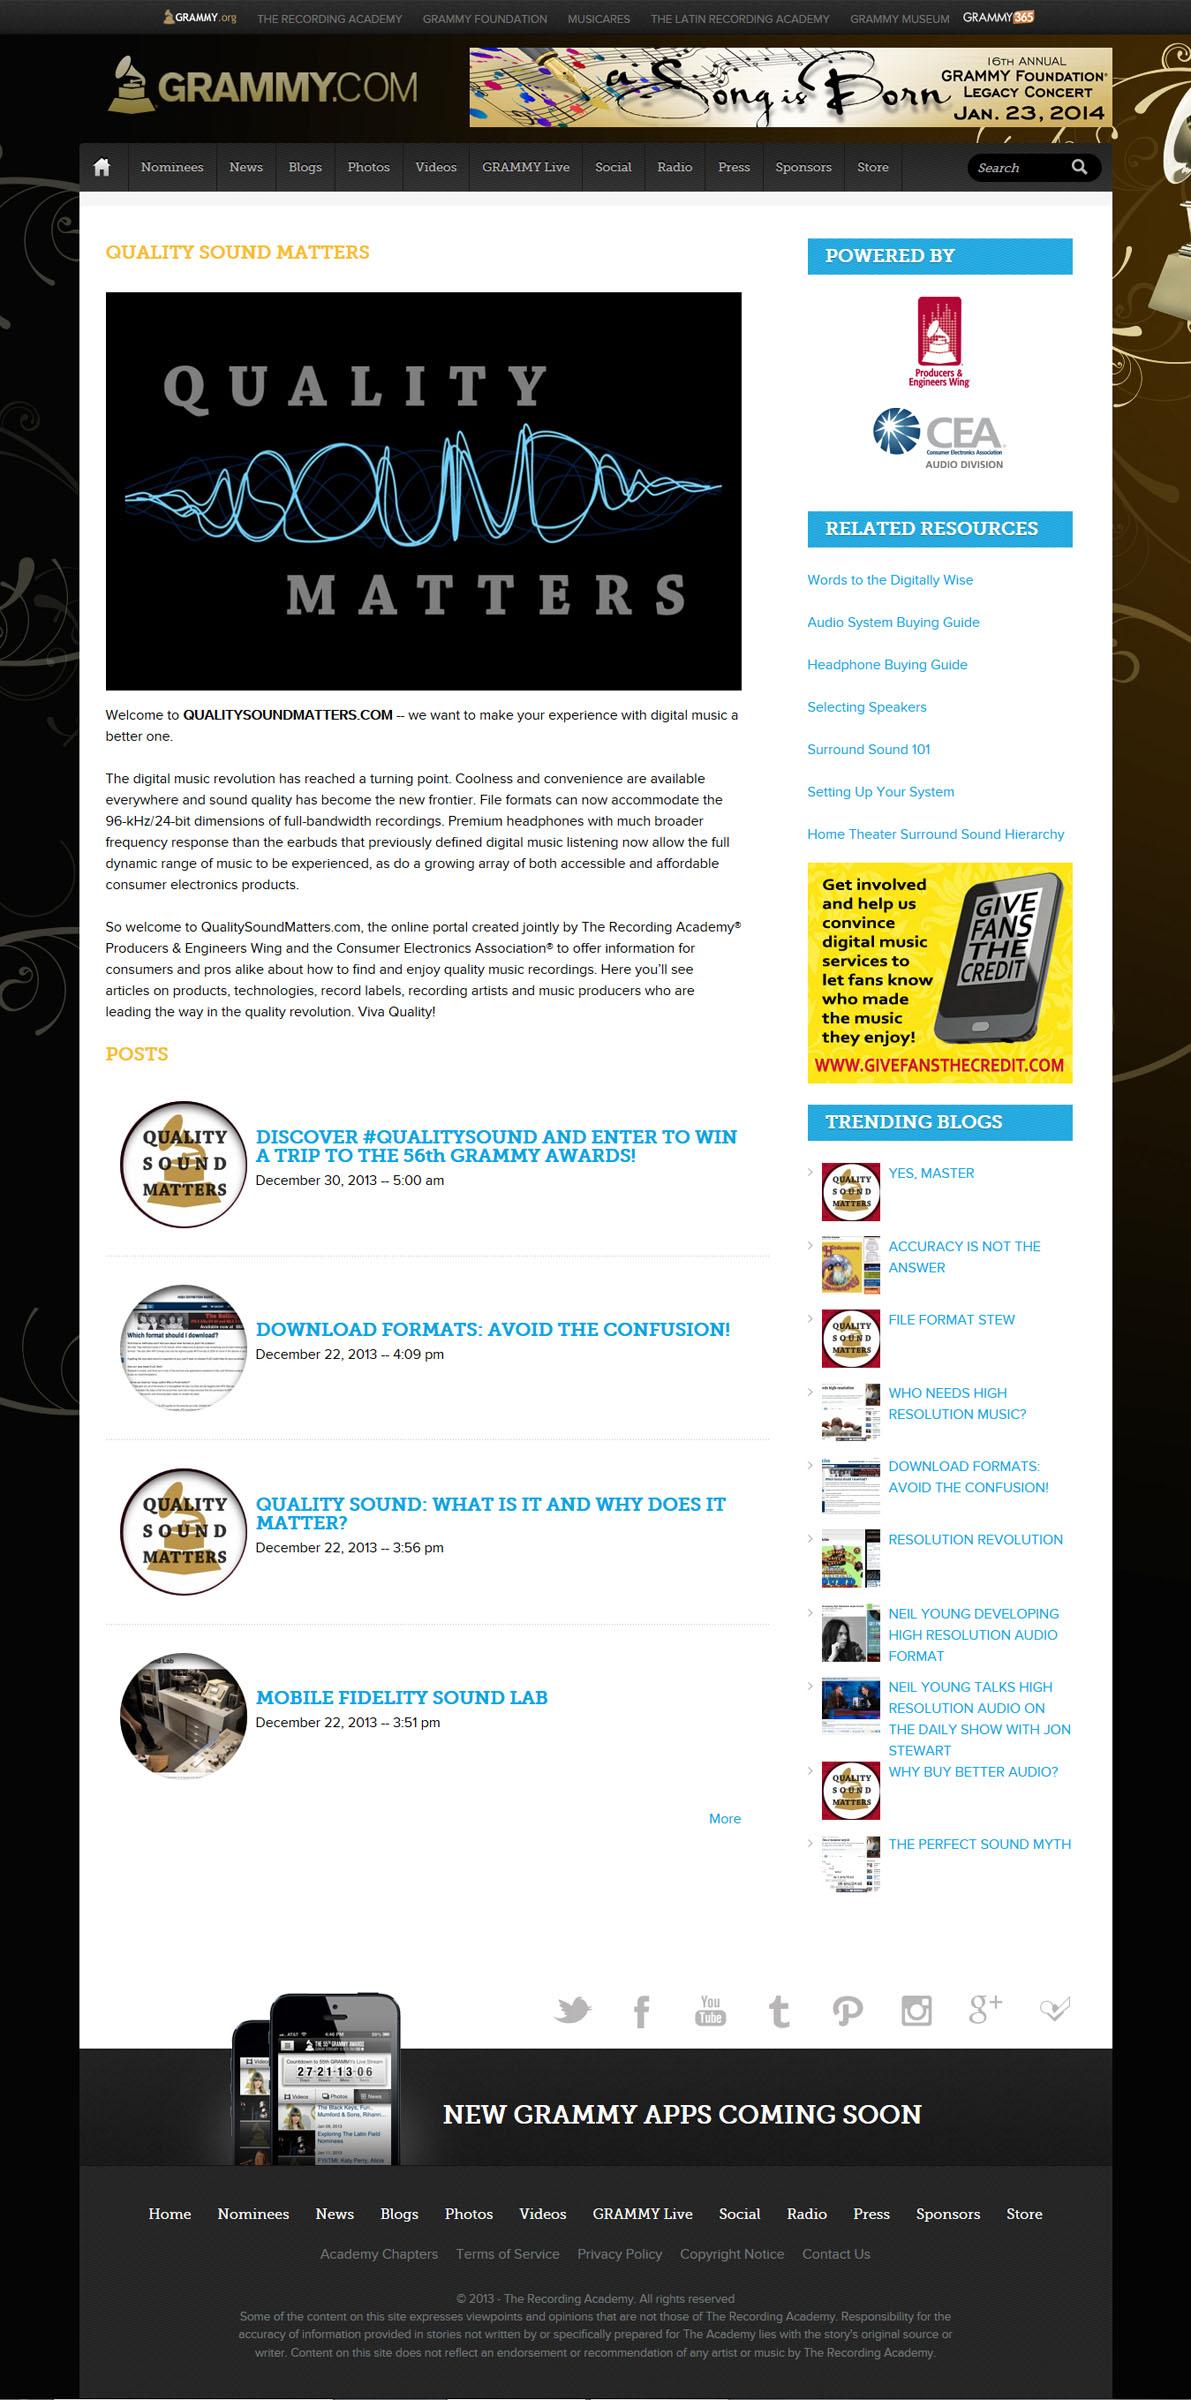 http://www.clynemedia.com/Recording_Academy/QSM_Update/QSM_screenshot.jpg